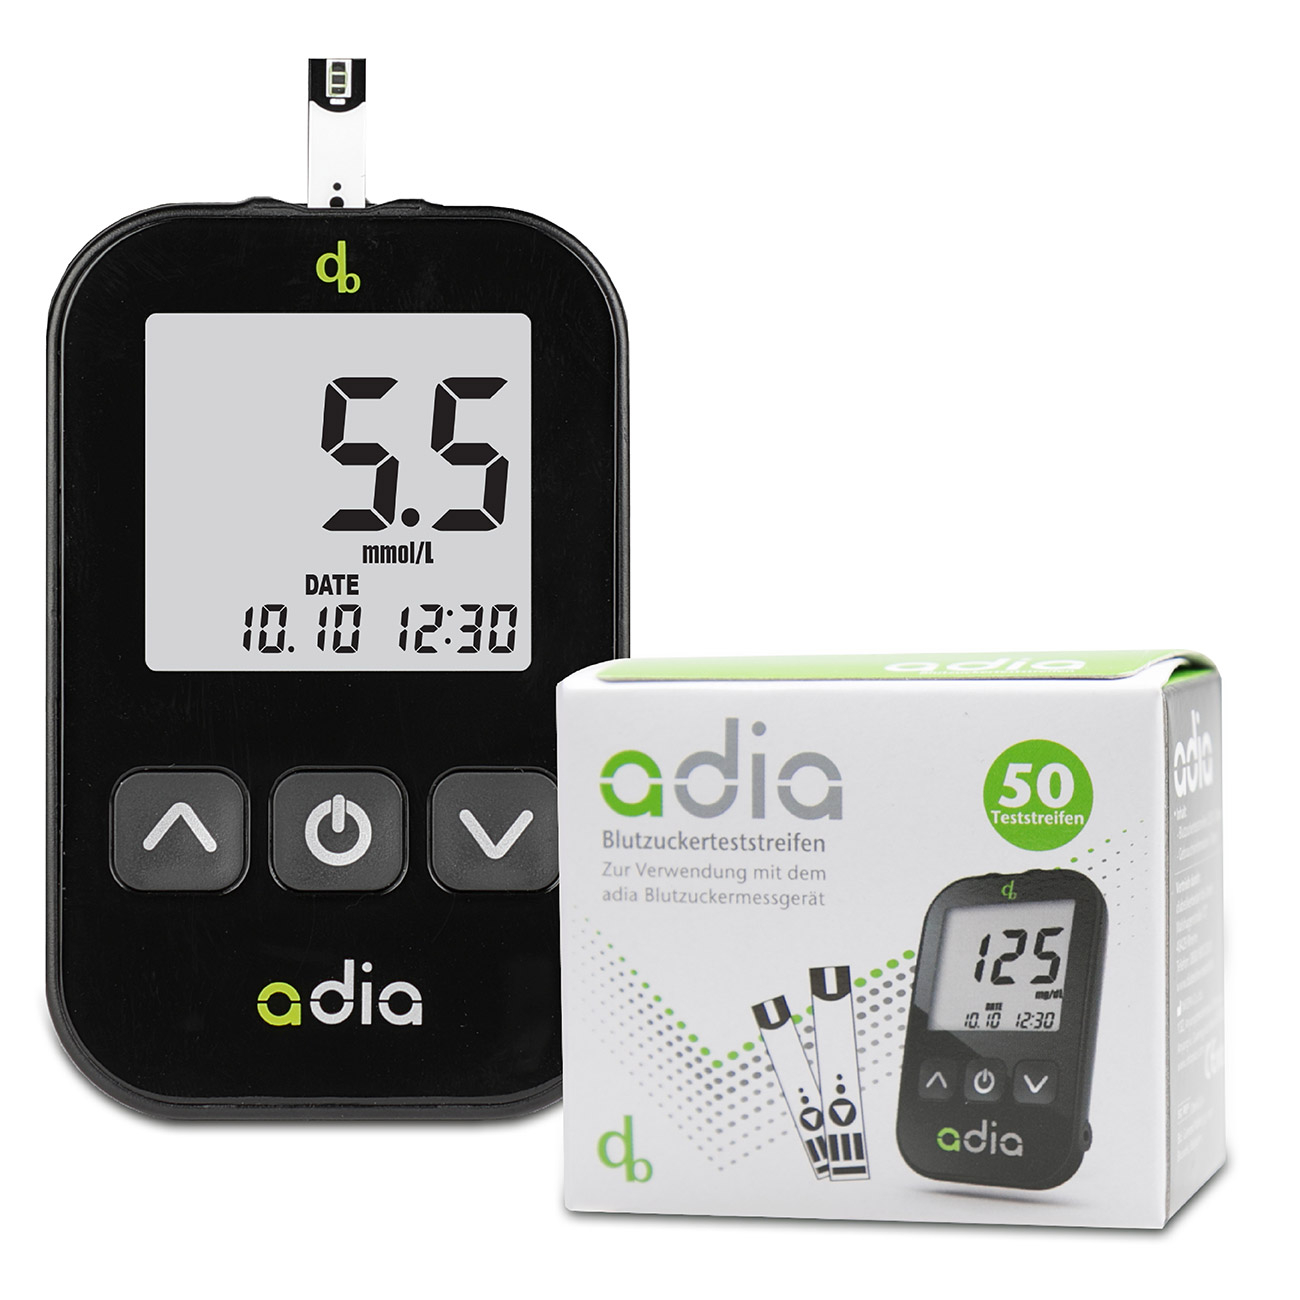 adia Blutzuckermessgerät - Starter Set inkl. 60 Teststreifen mmol/l